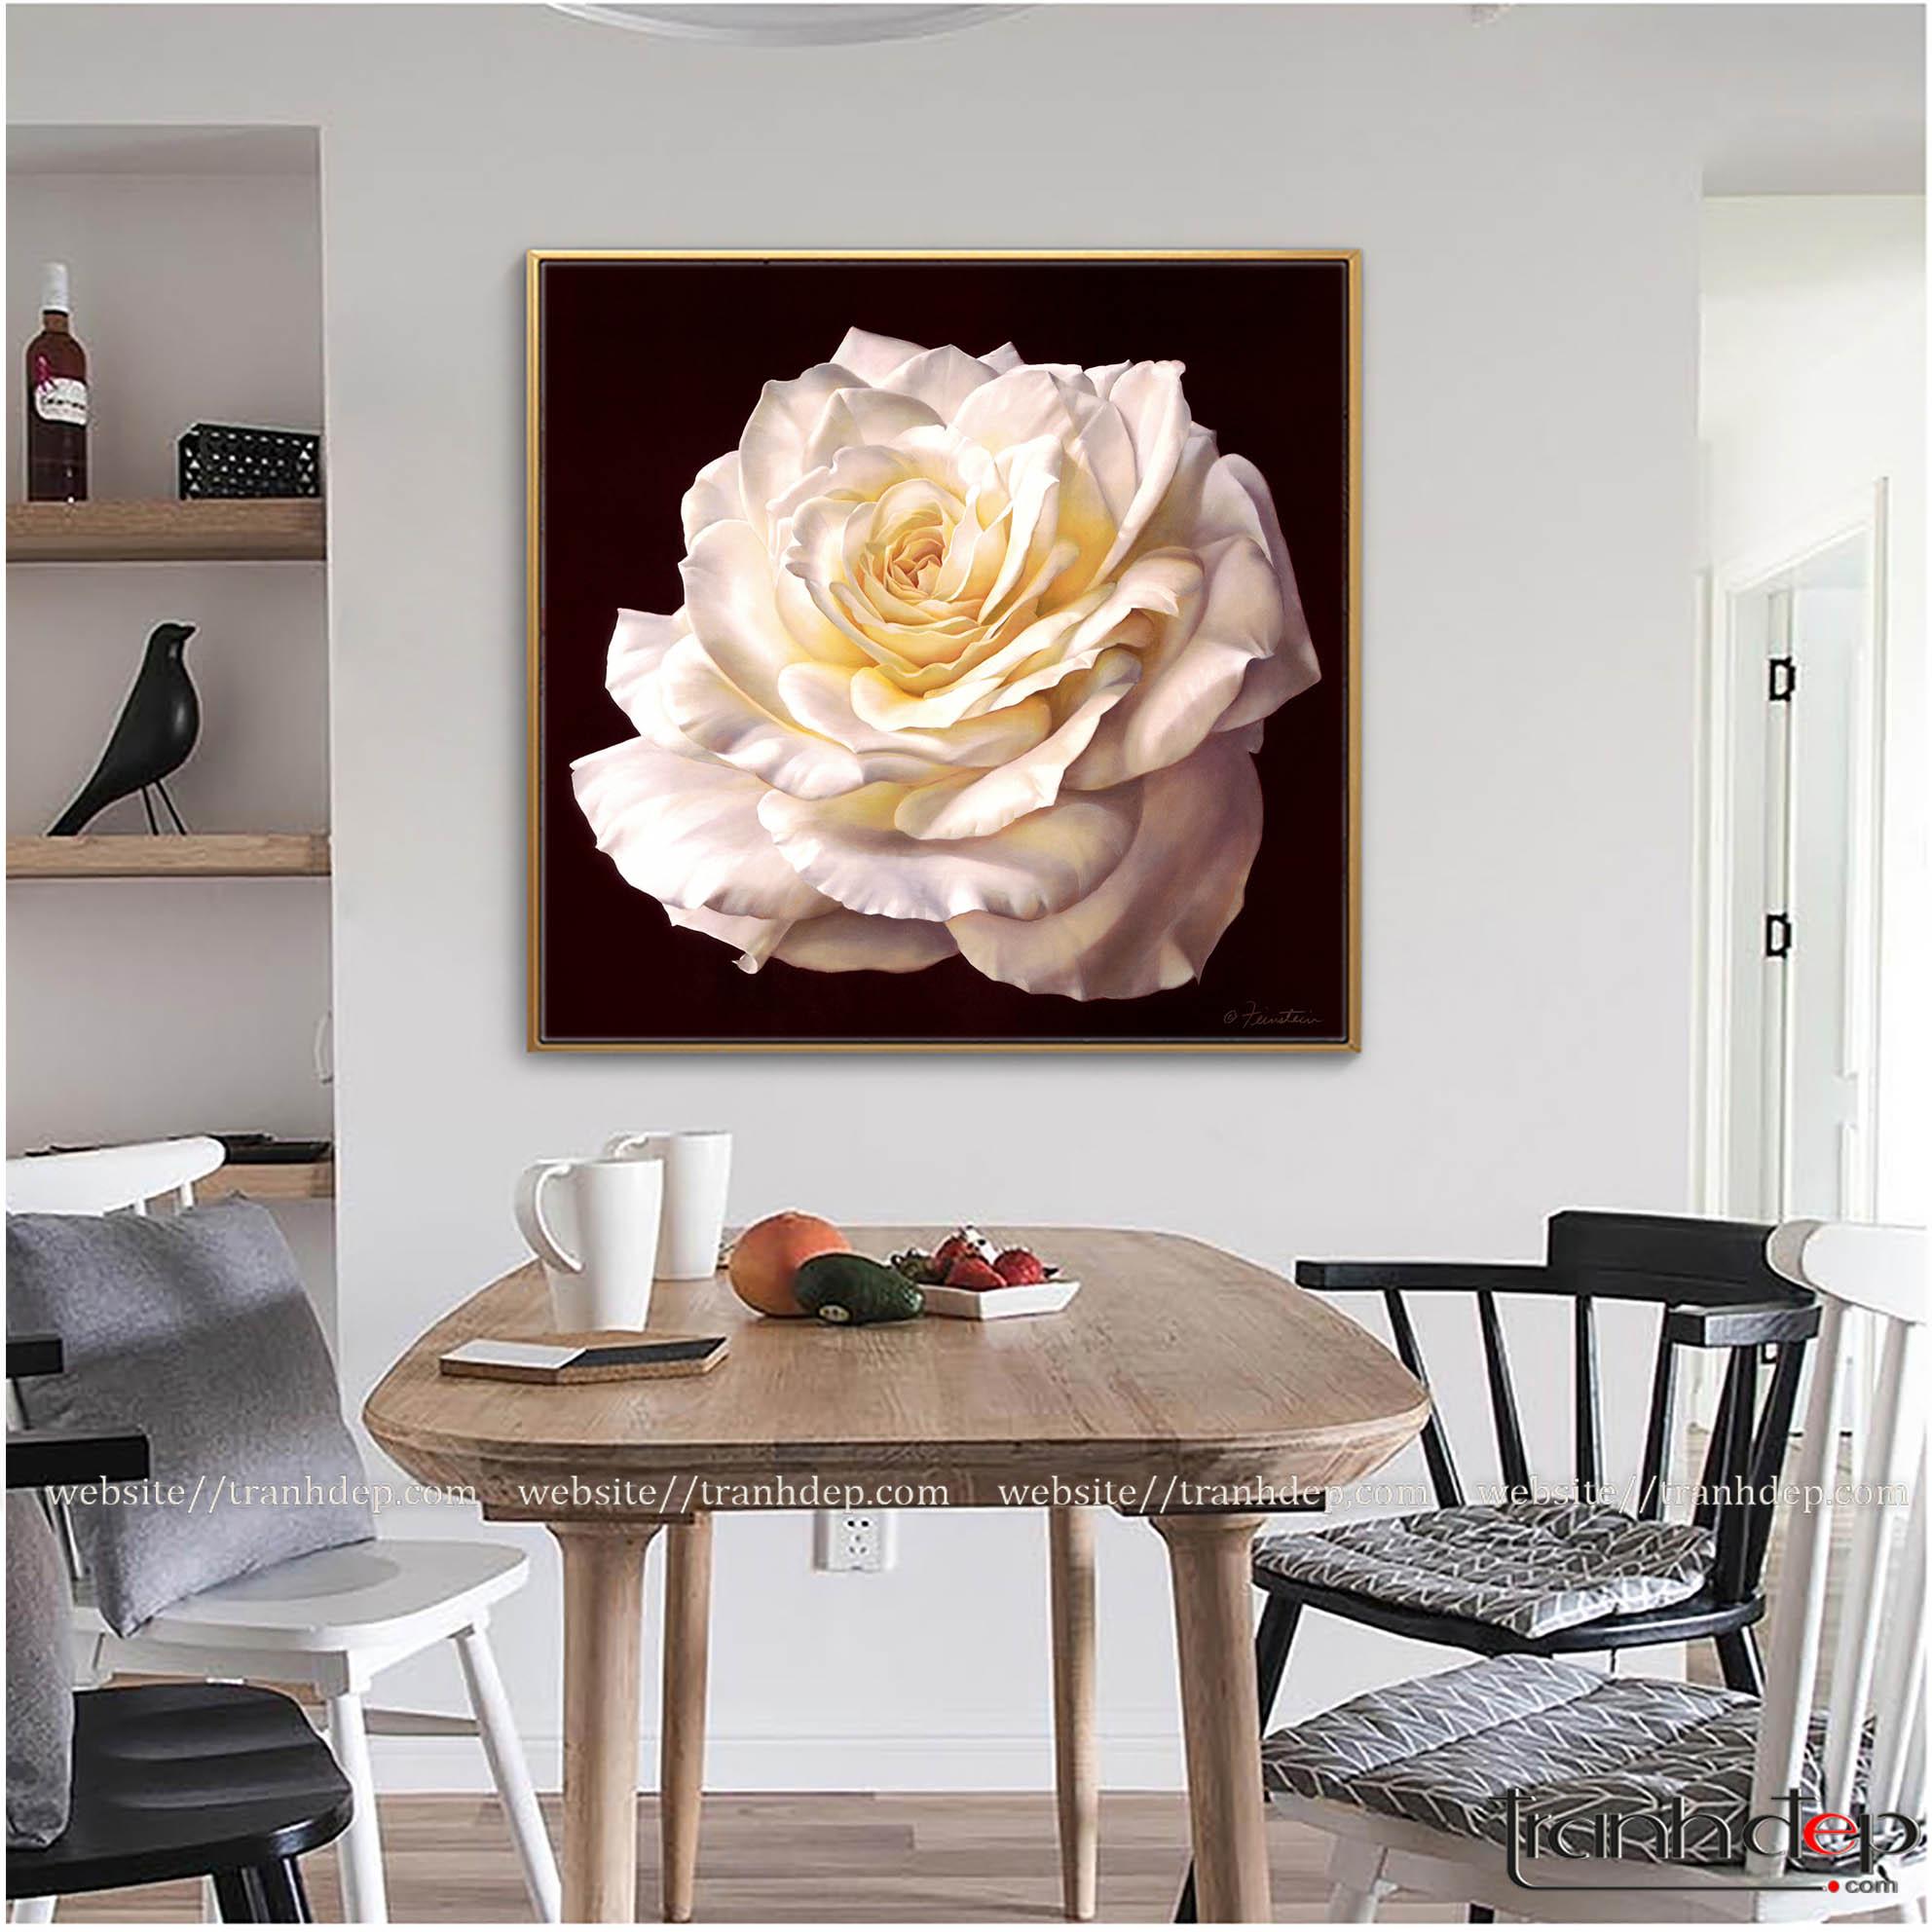 Tranh hoa hồng treo phòng ăn